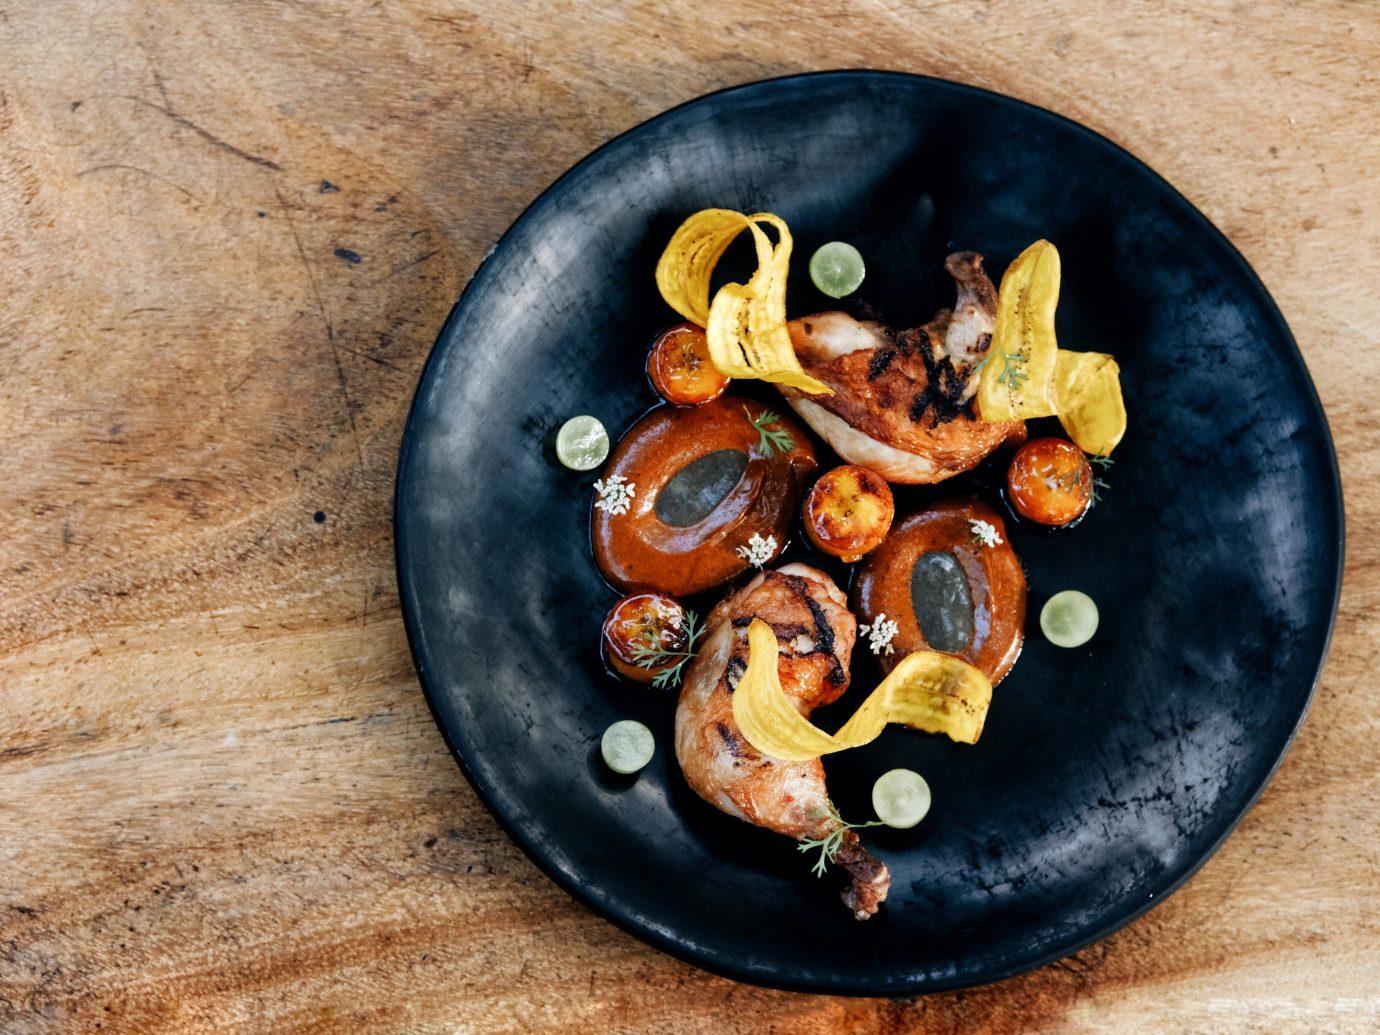 City Mexico Trip Ideas Tulum ground food plate floor black wooden vegetable recipe